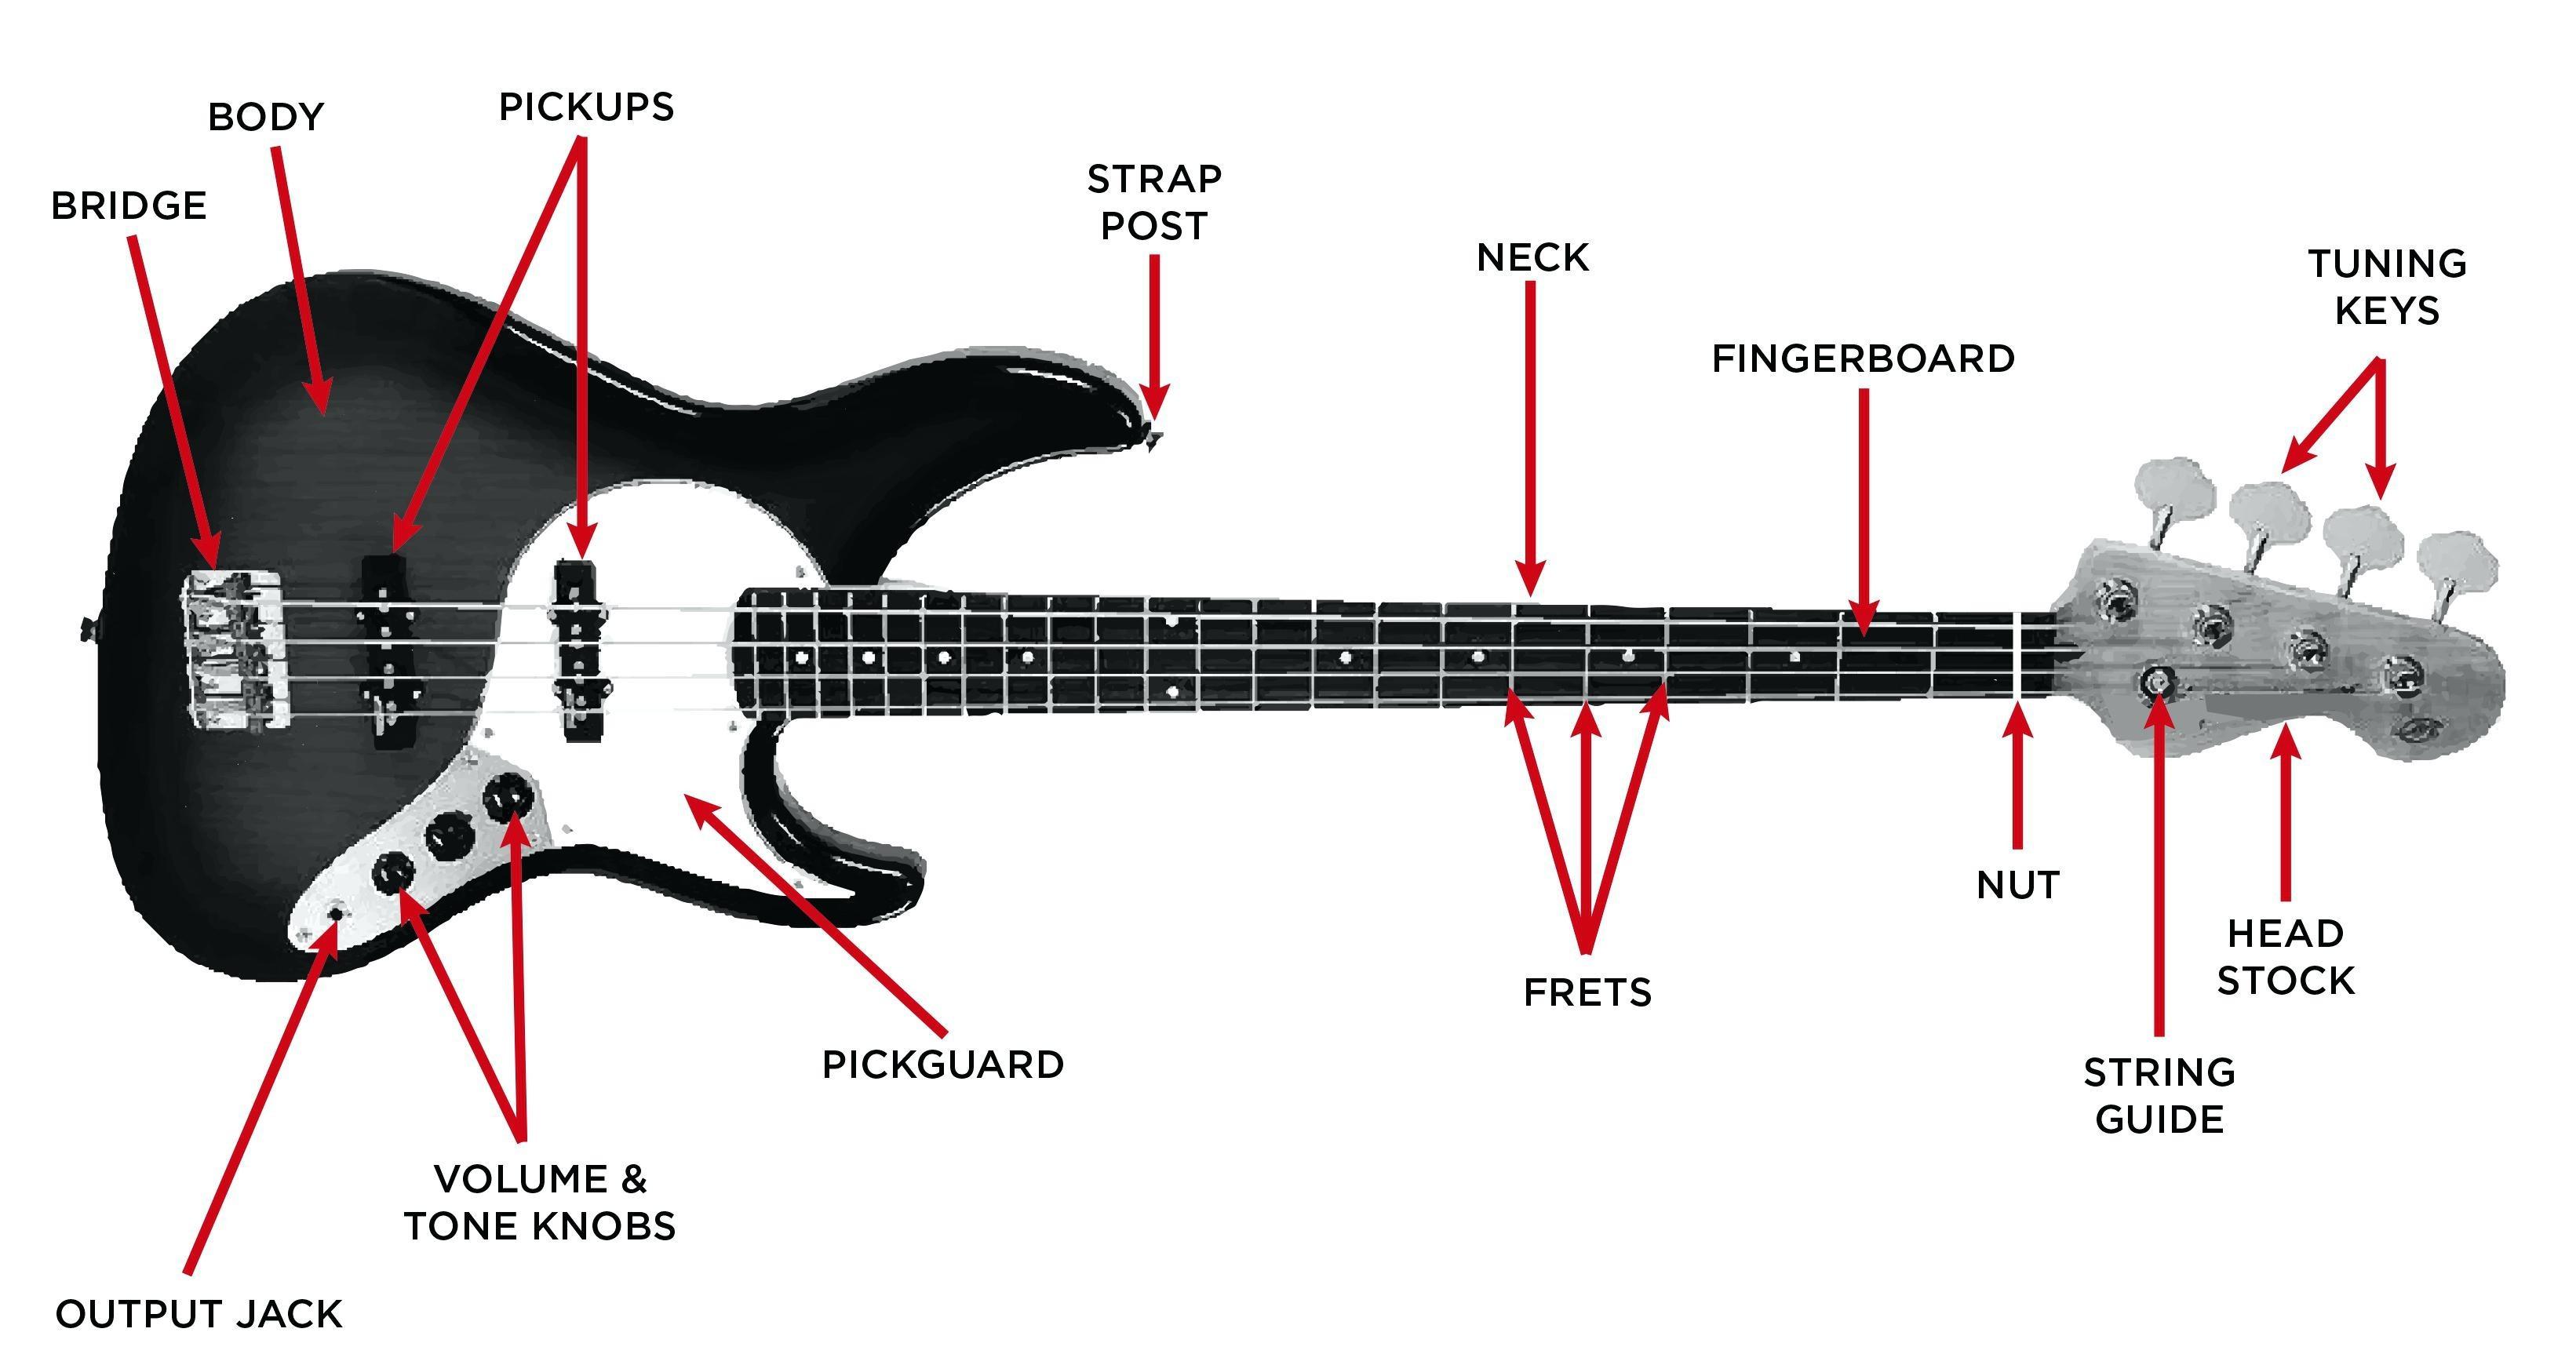 Fender Jazz Bass Pickup Wiring Diagram New Fender Bass Wiring Diagrams Hbphelp